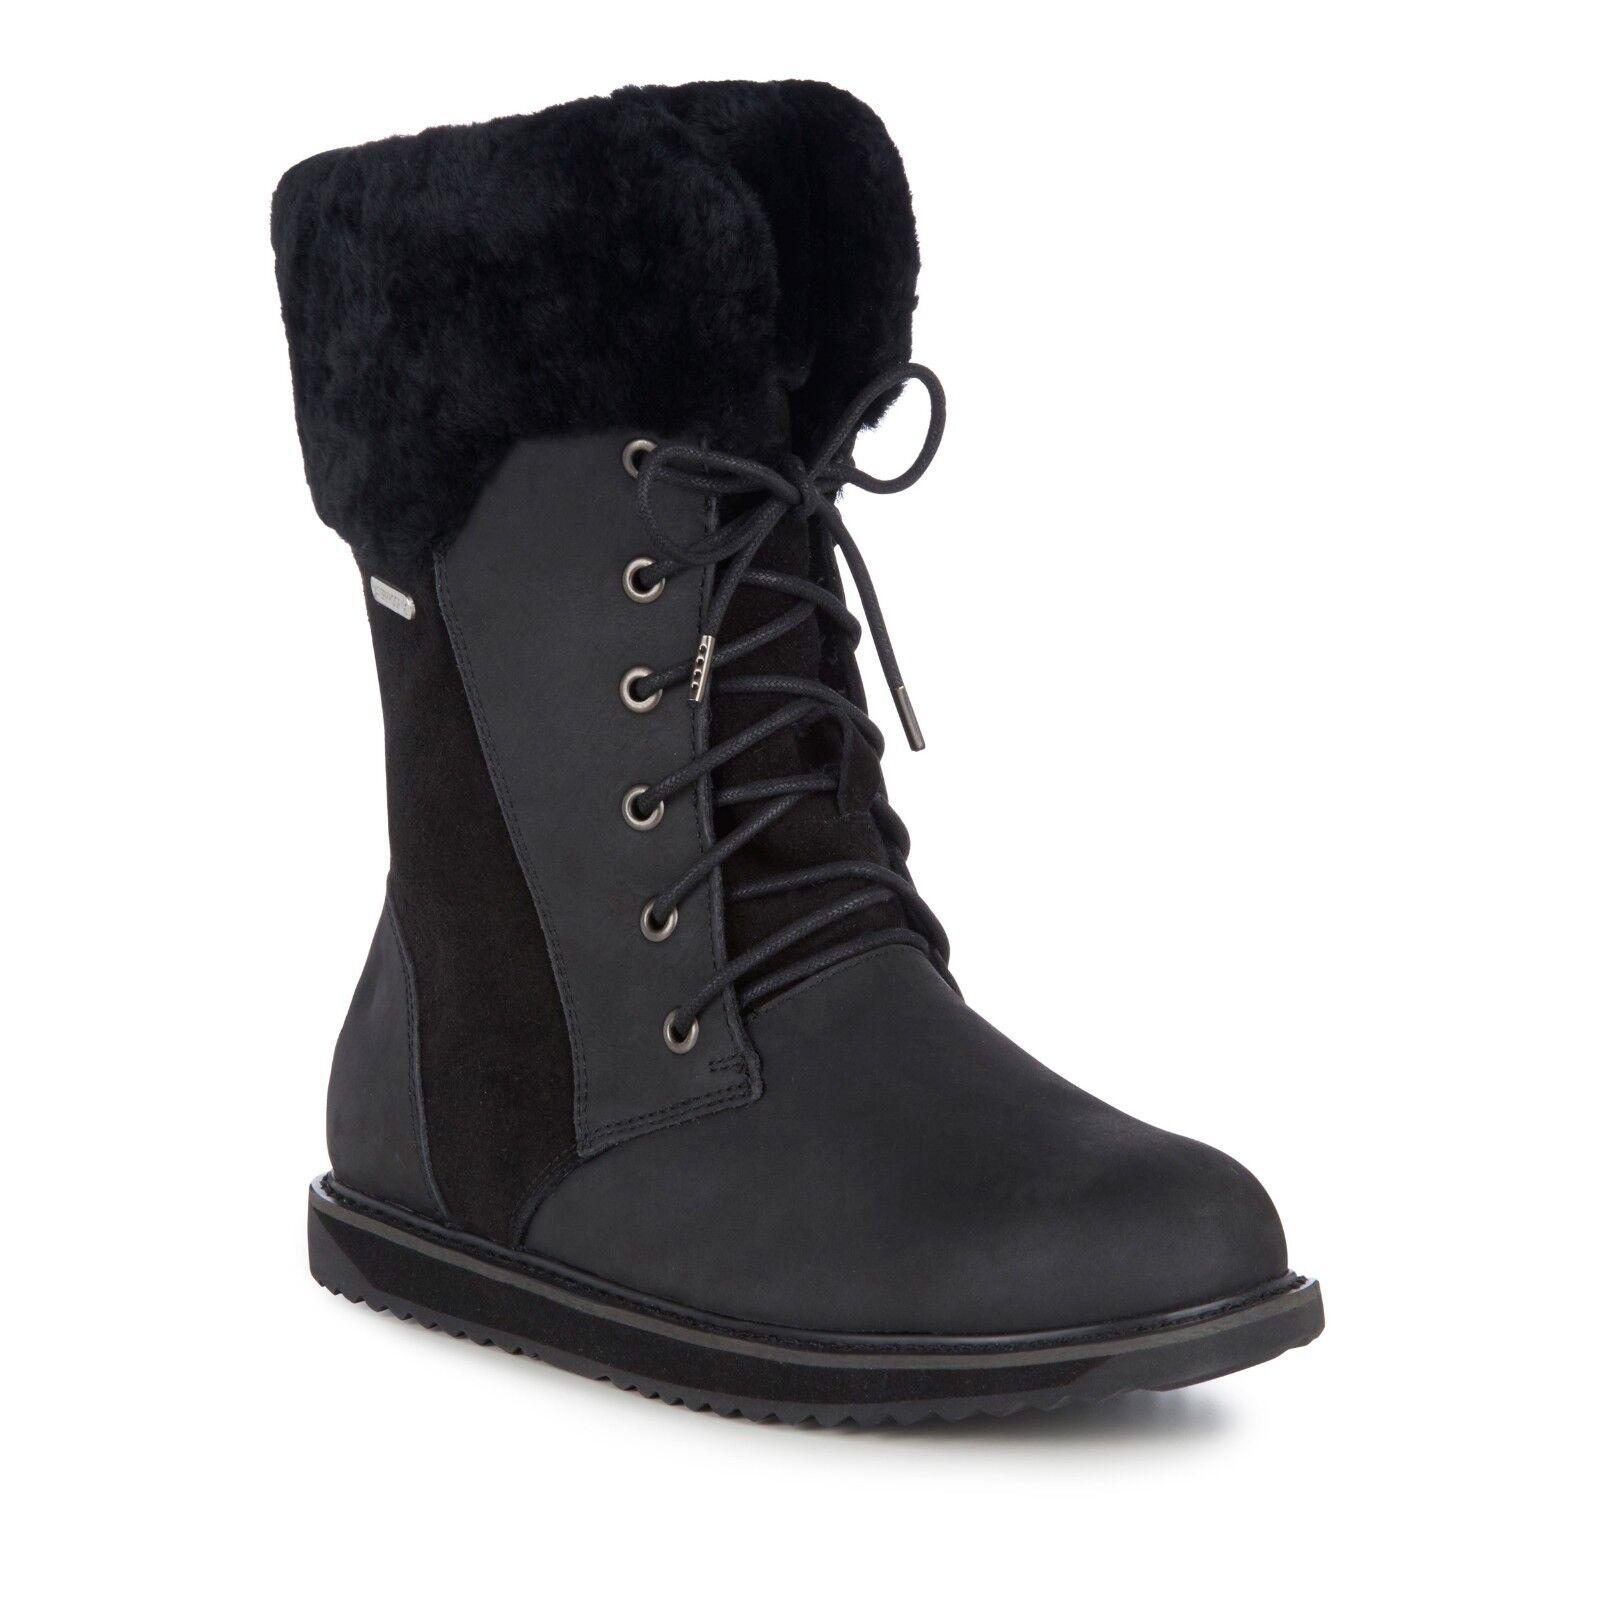 Women's EMU Boots Shoreline Leather Warm Sheepskin Linined Black Boot